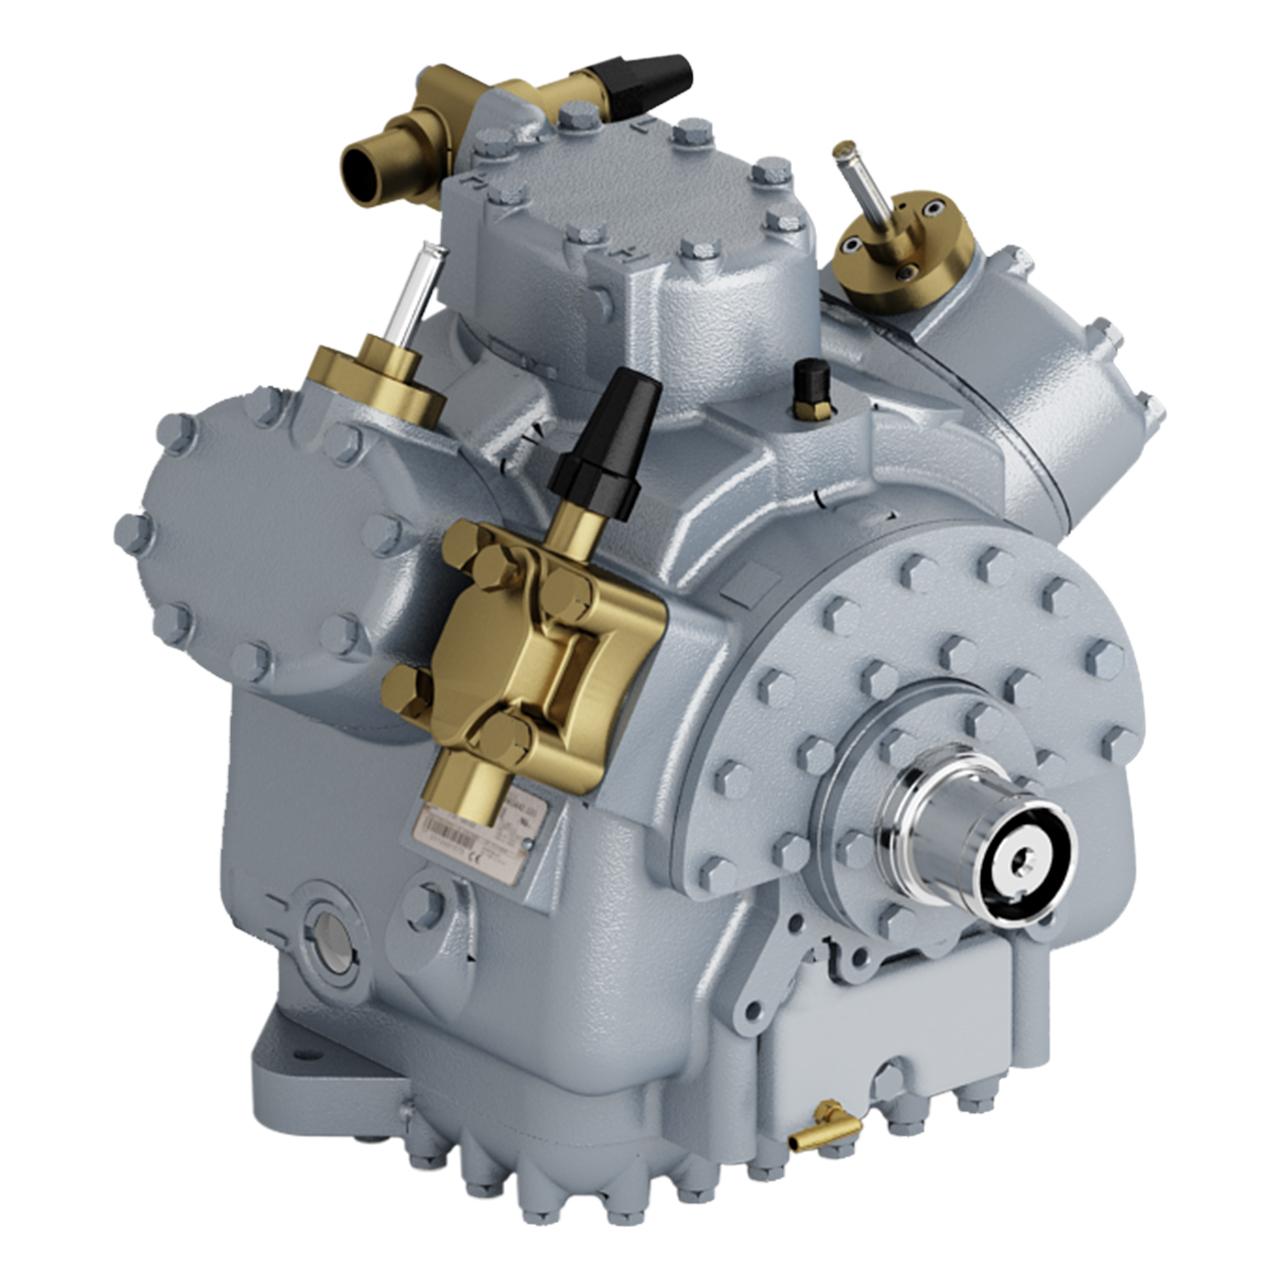 carlyle-compressor-05g